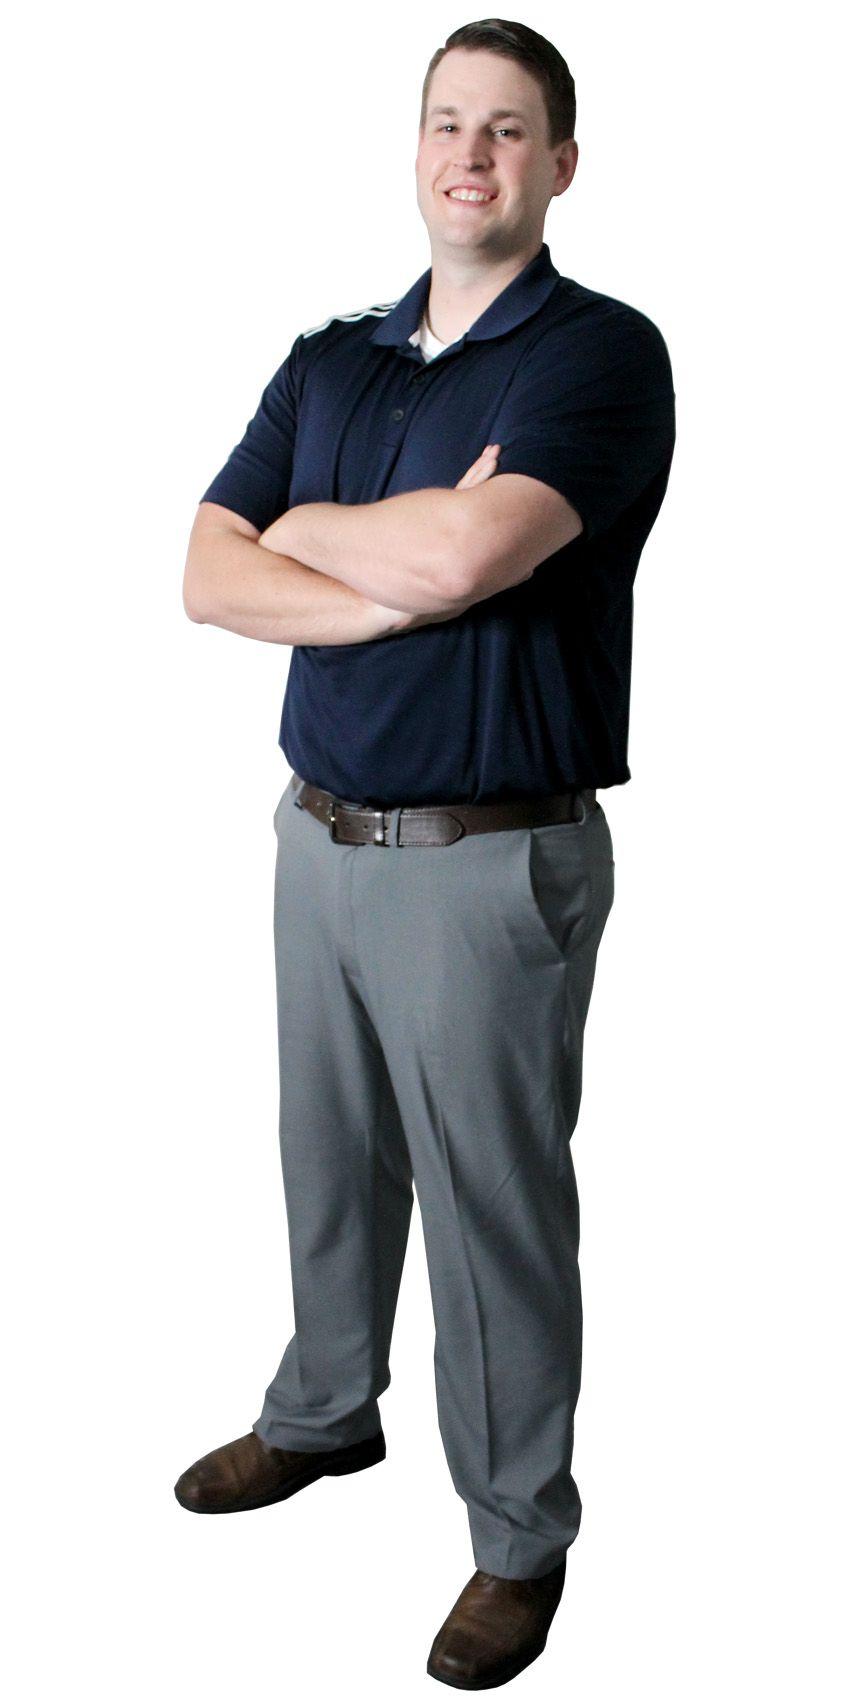 Dr. Andrew Brugman